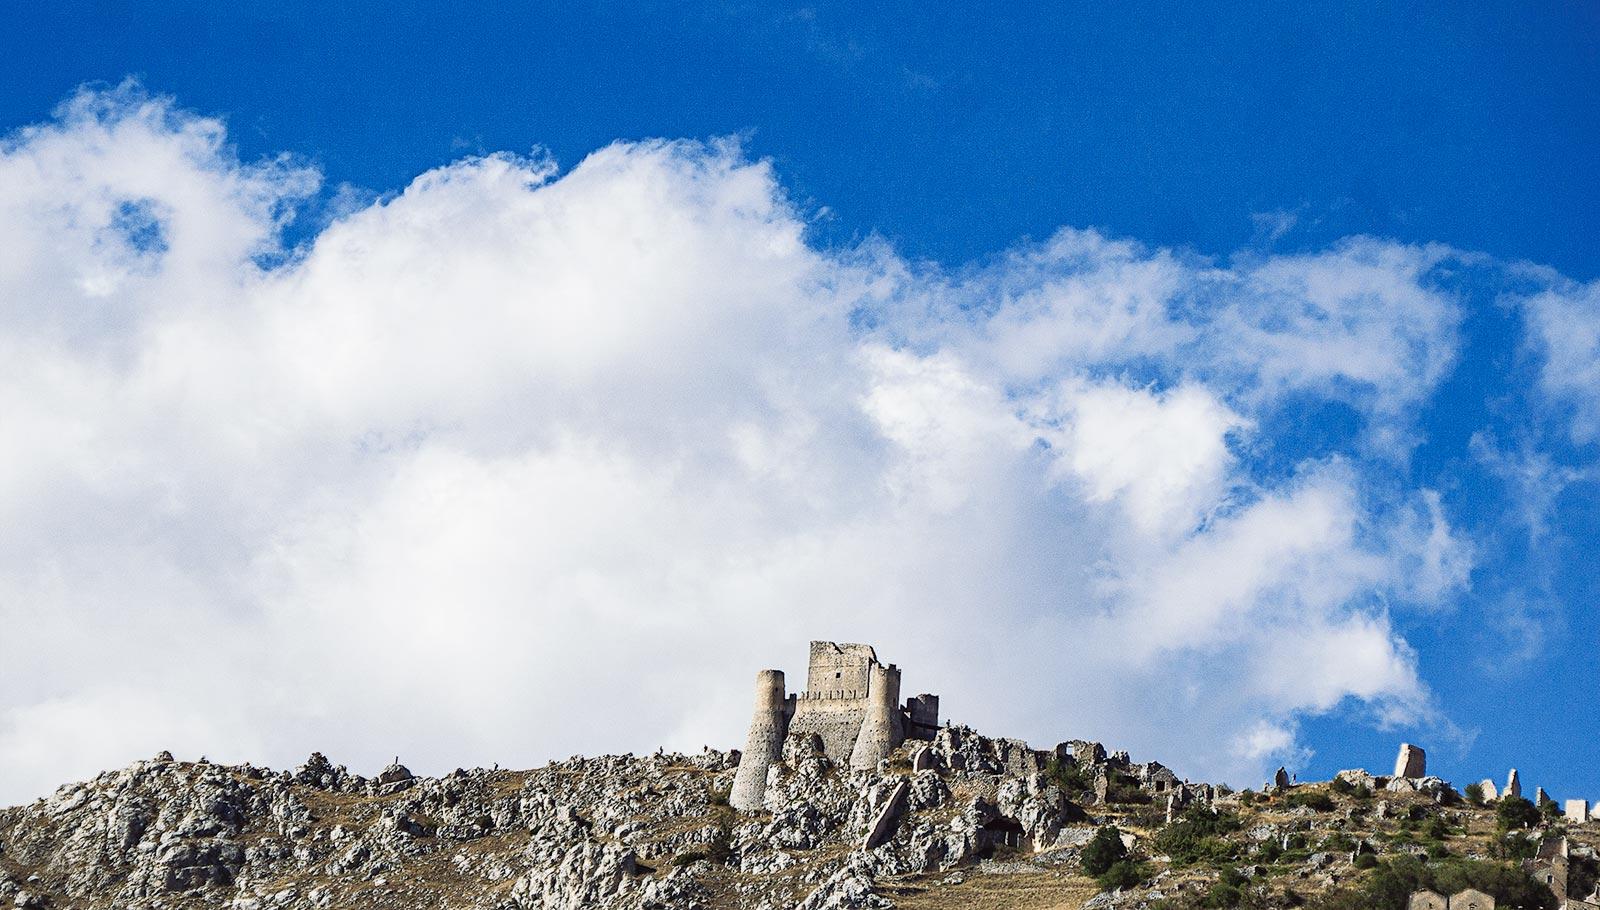 Joyside Abruzzo on the road